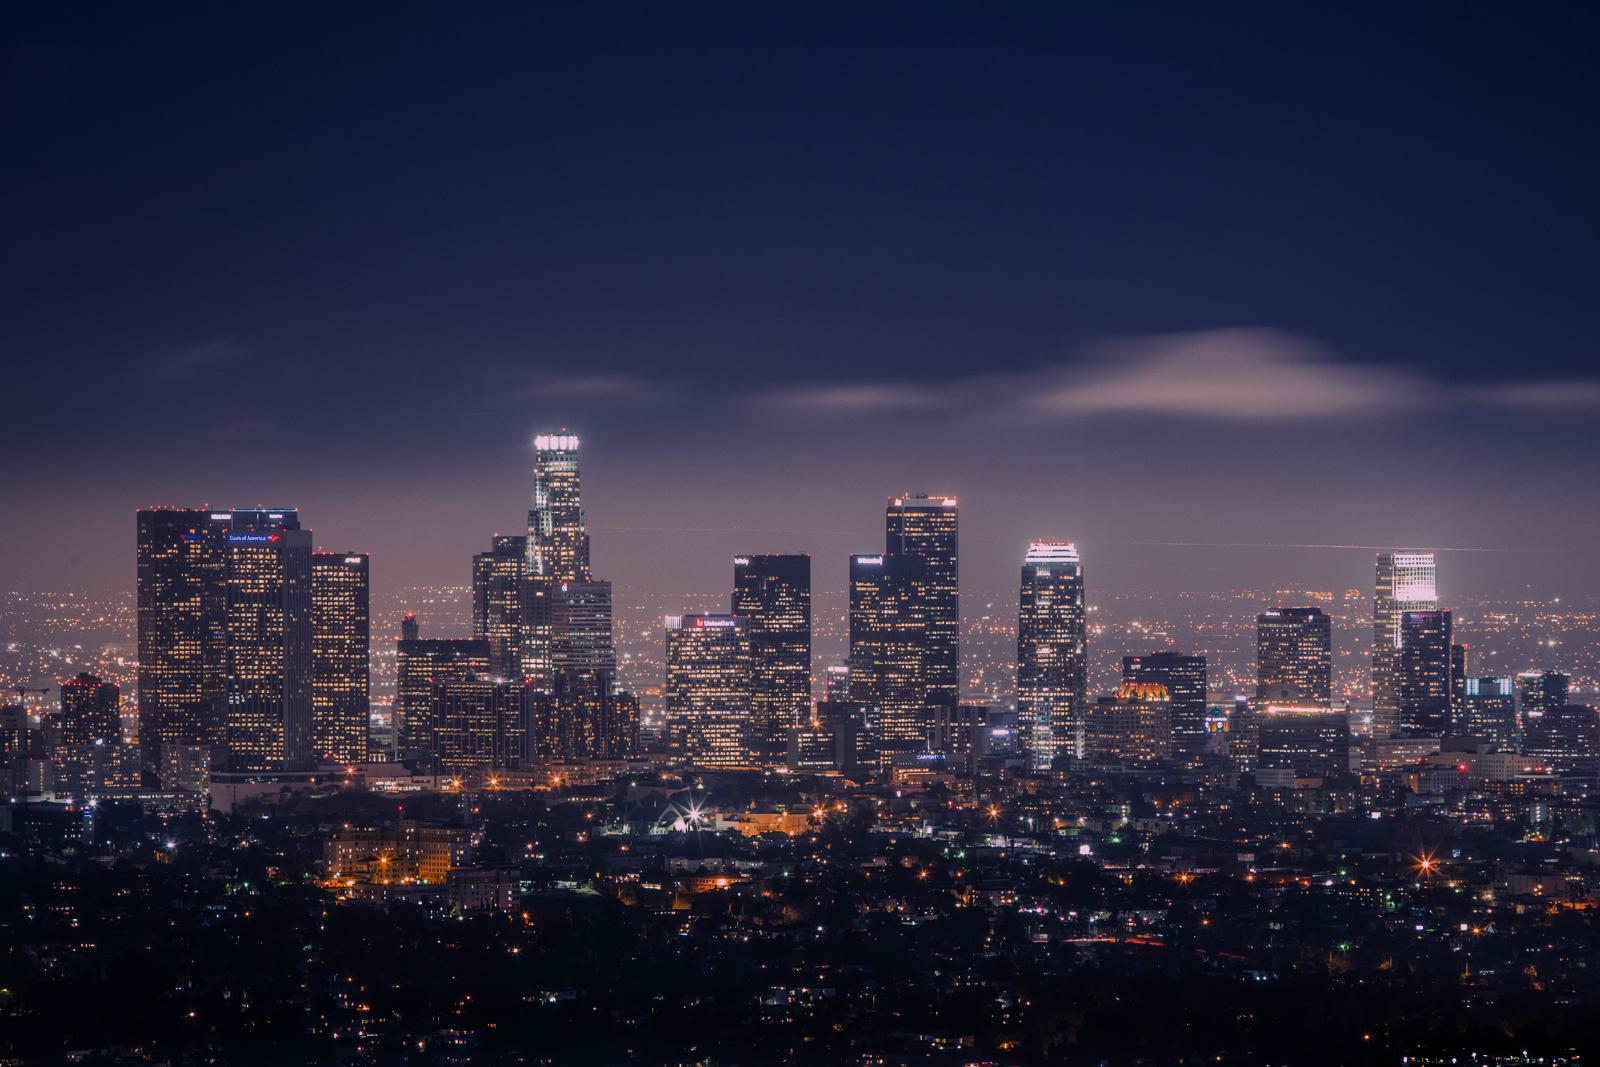 bolfo_0008s_0001_LA Downtown